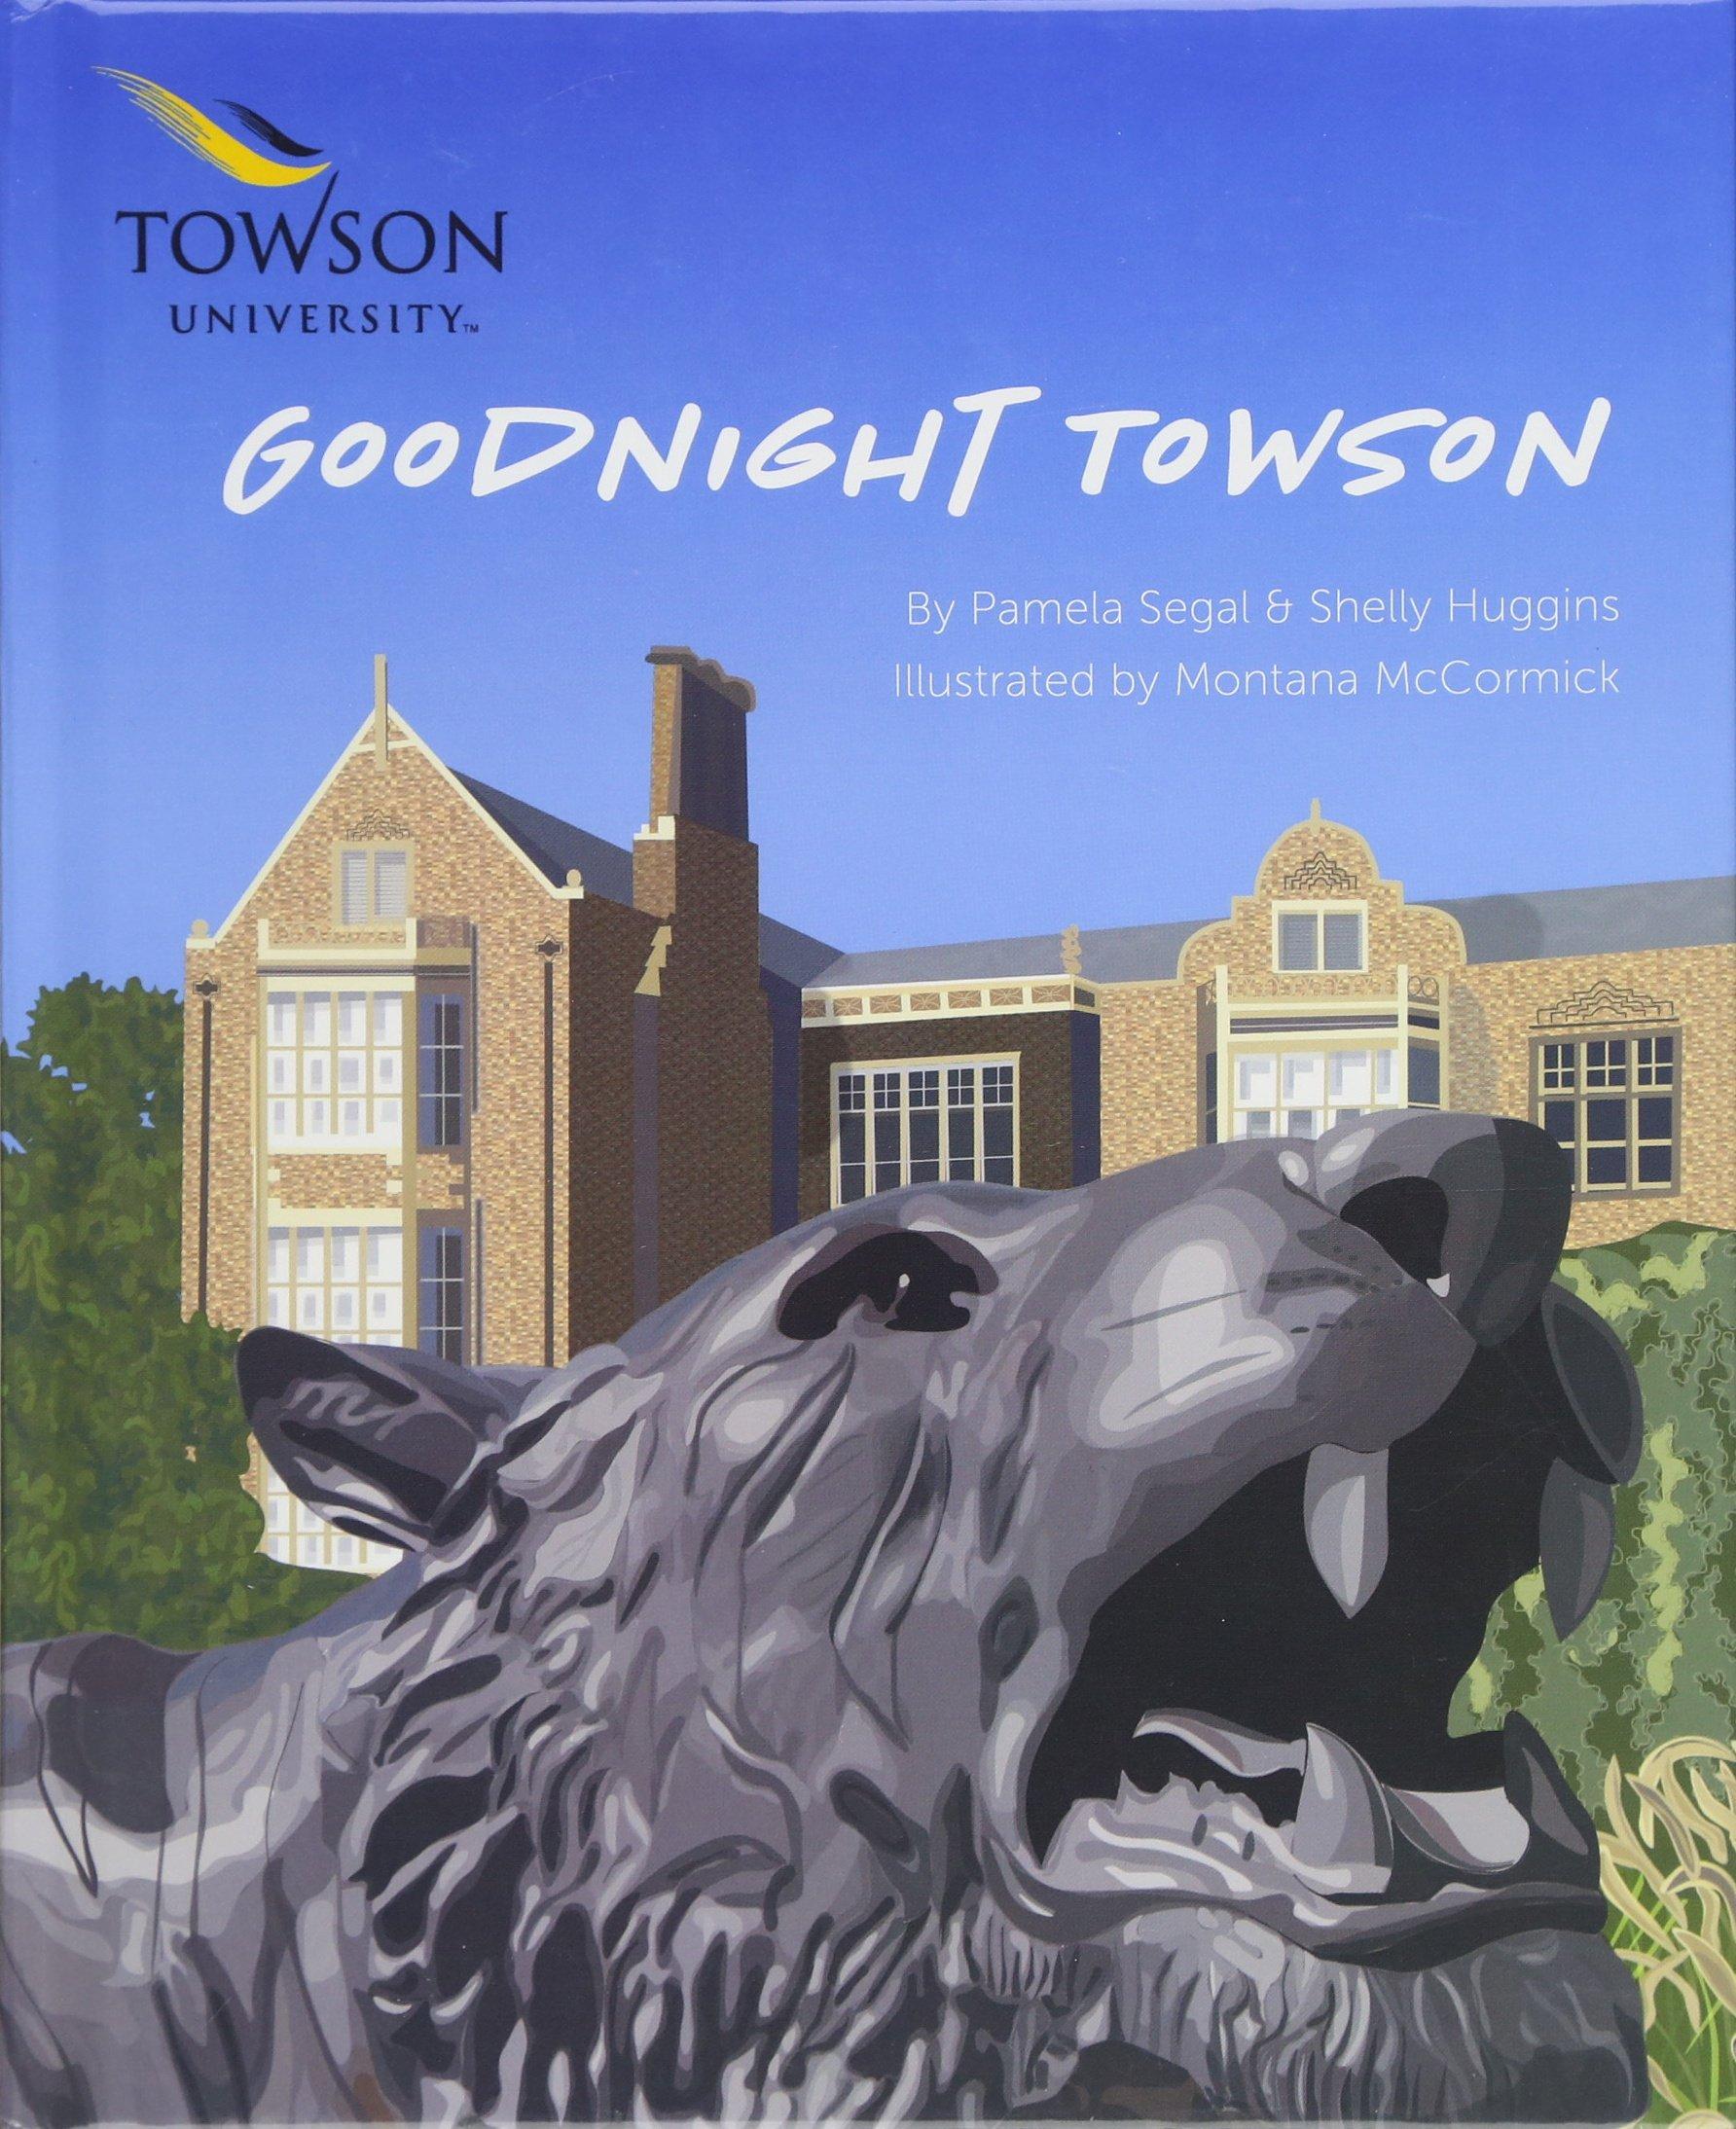 Goodnight Towson